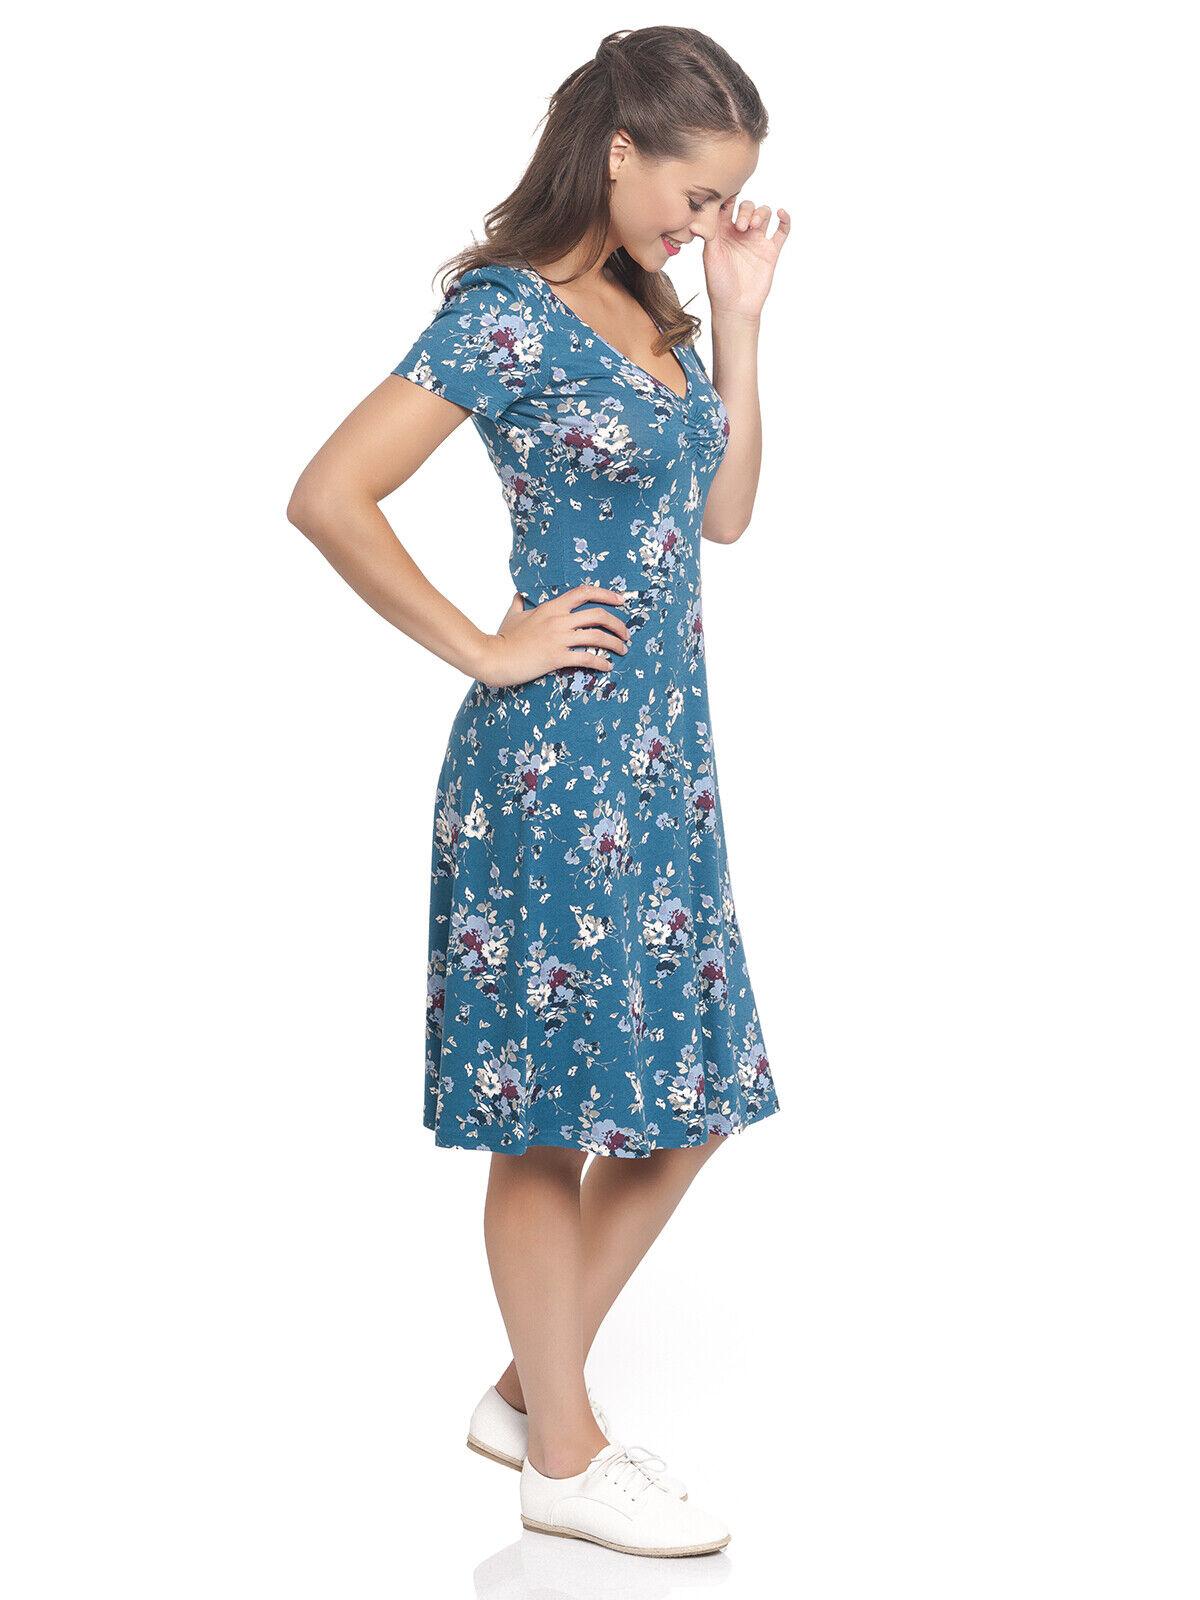 Kleid,  Mon Amour , Marke  Vive Maria, Größe M. L